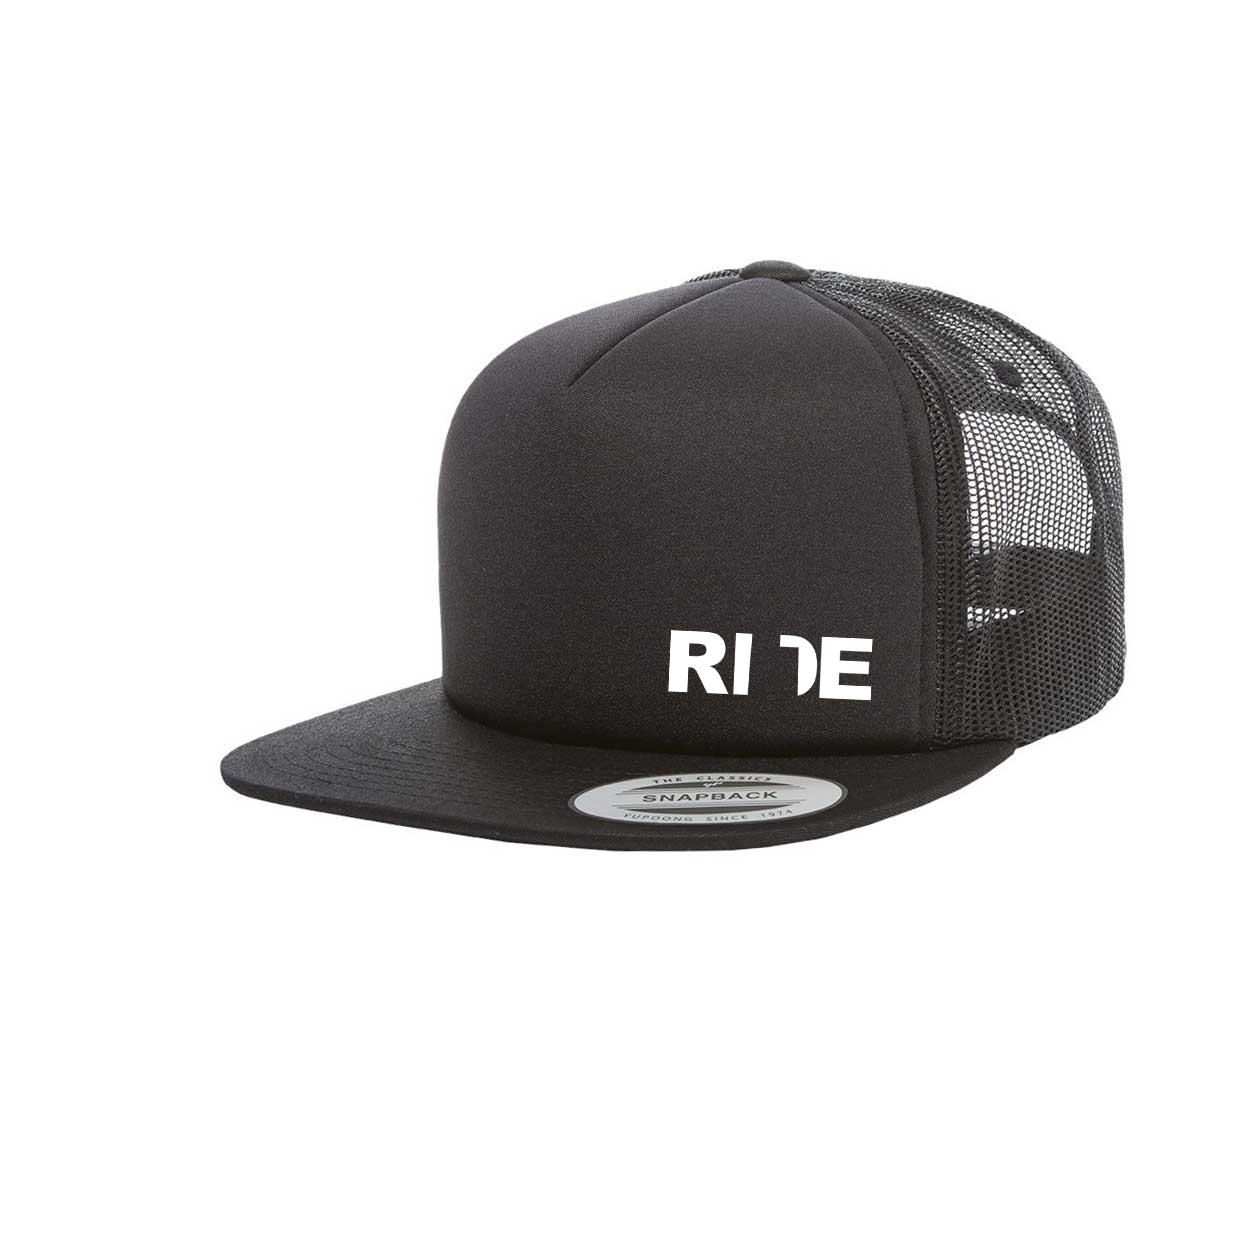 Ride Utah Night Out Premium Foam Flat Brim Snapback Hat Black (White Logo)